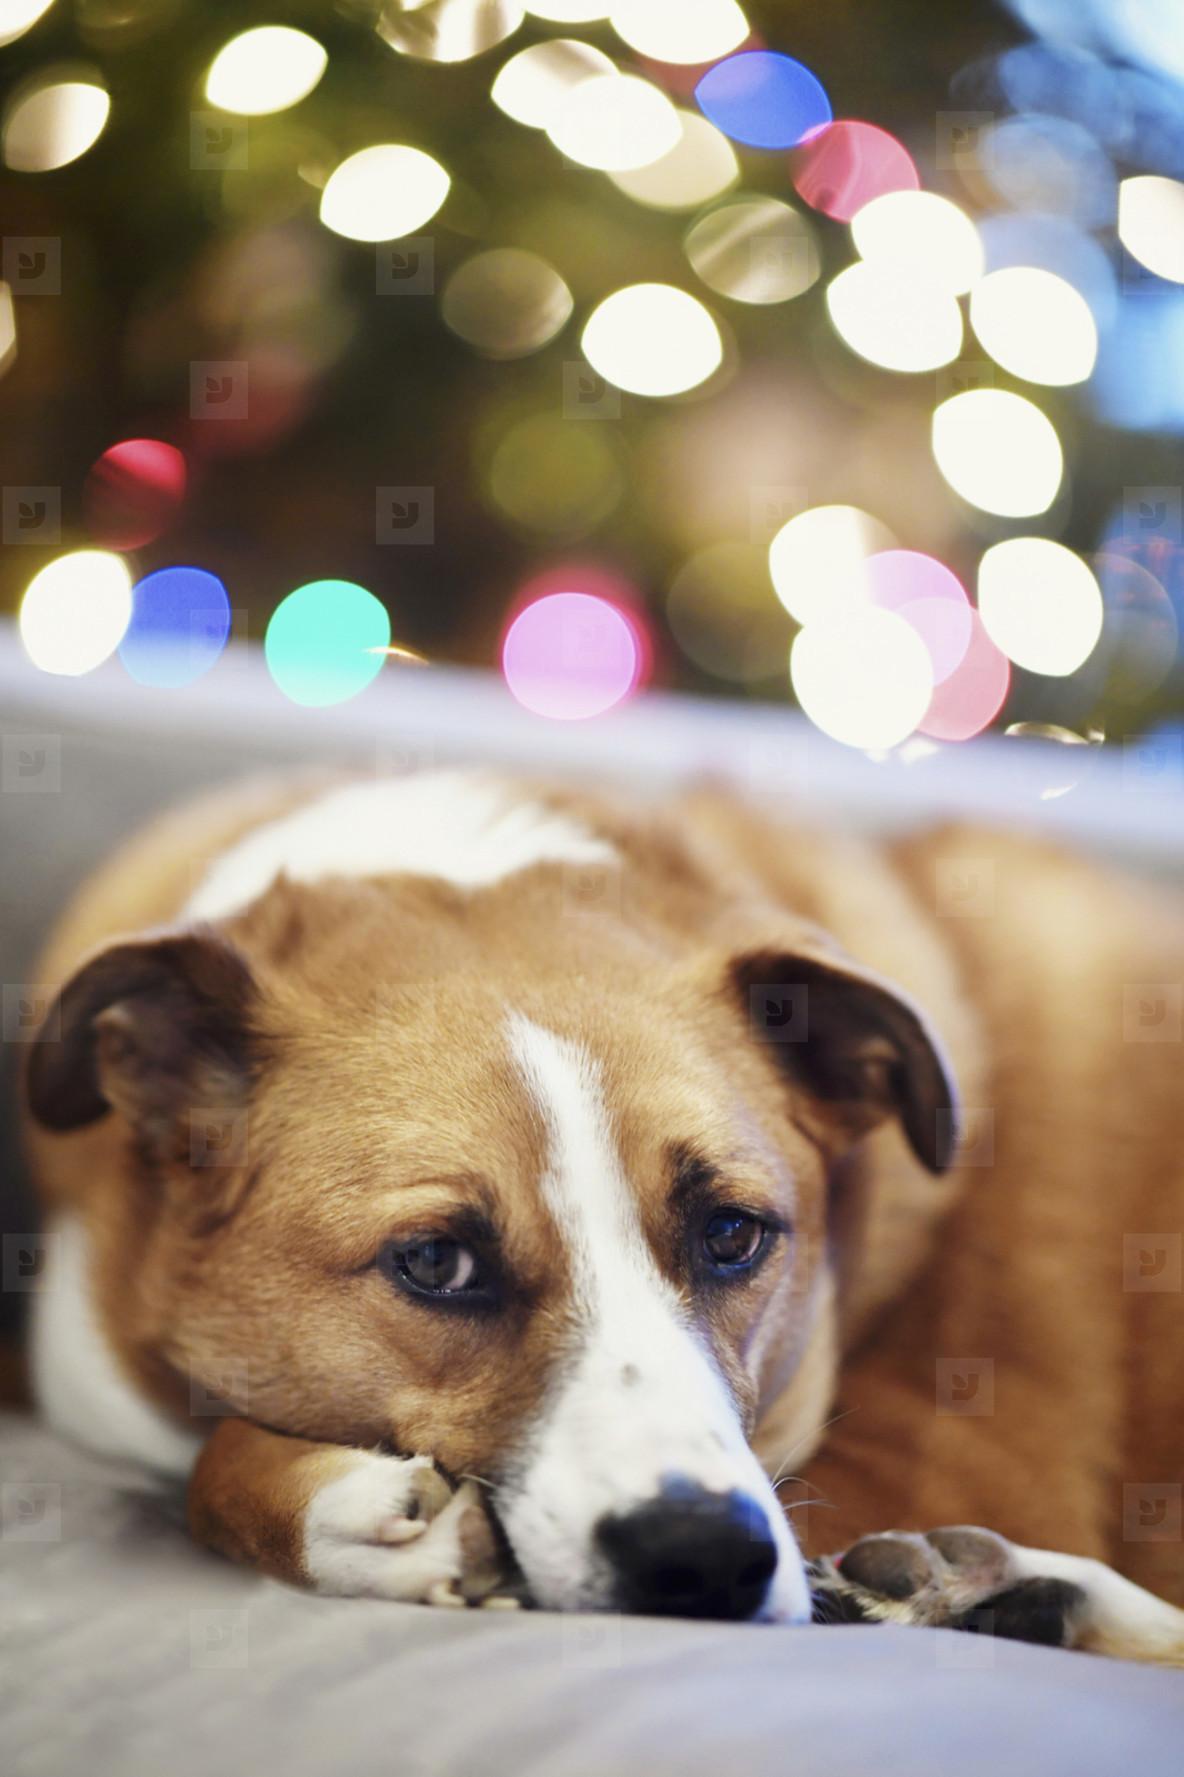 Portrait cute dog curled up on sofa near Christmas tree